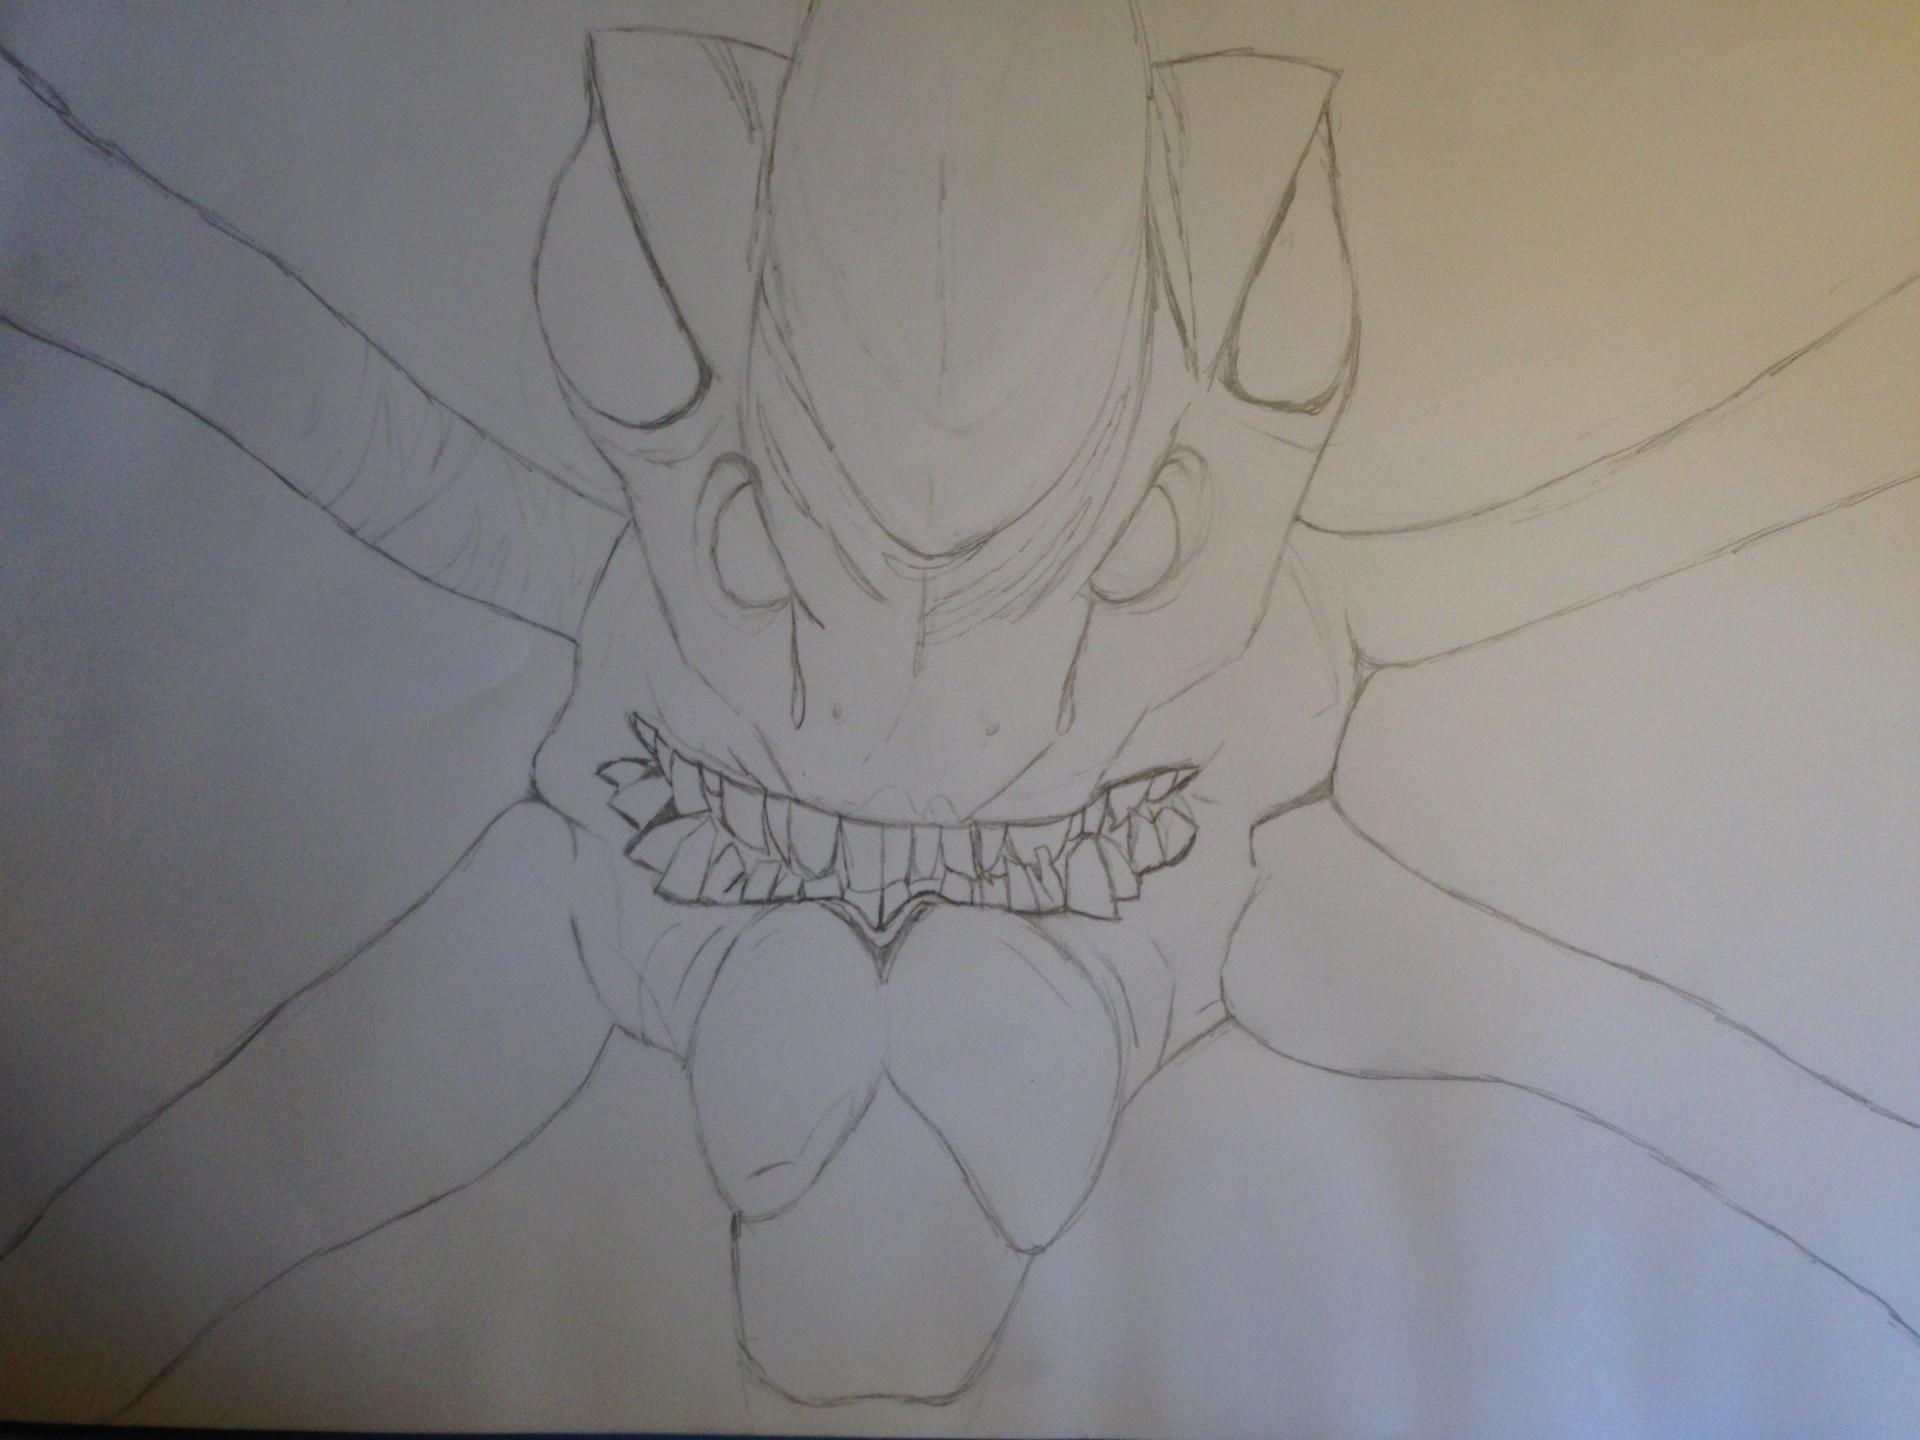 ArtStation - Reaper Leviathan, Joseph Crick